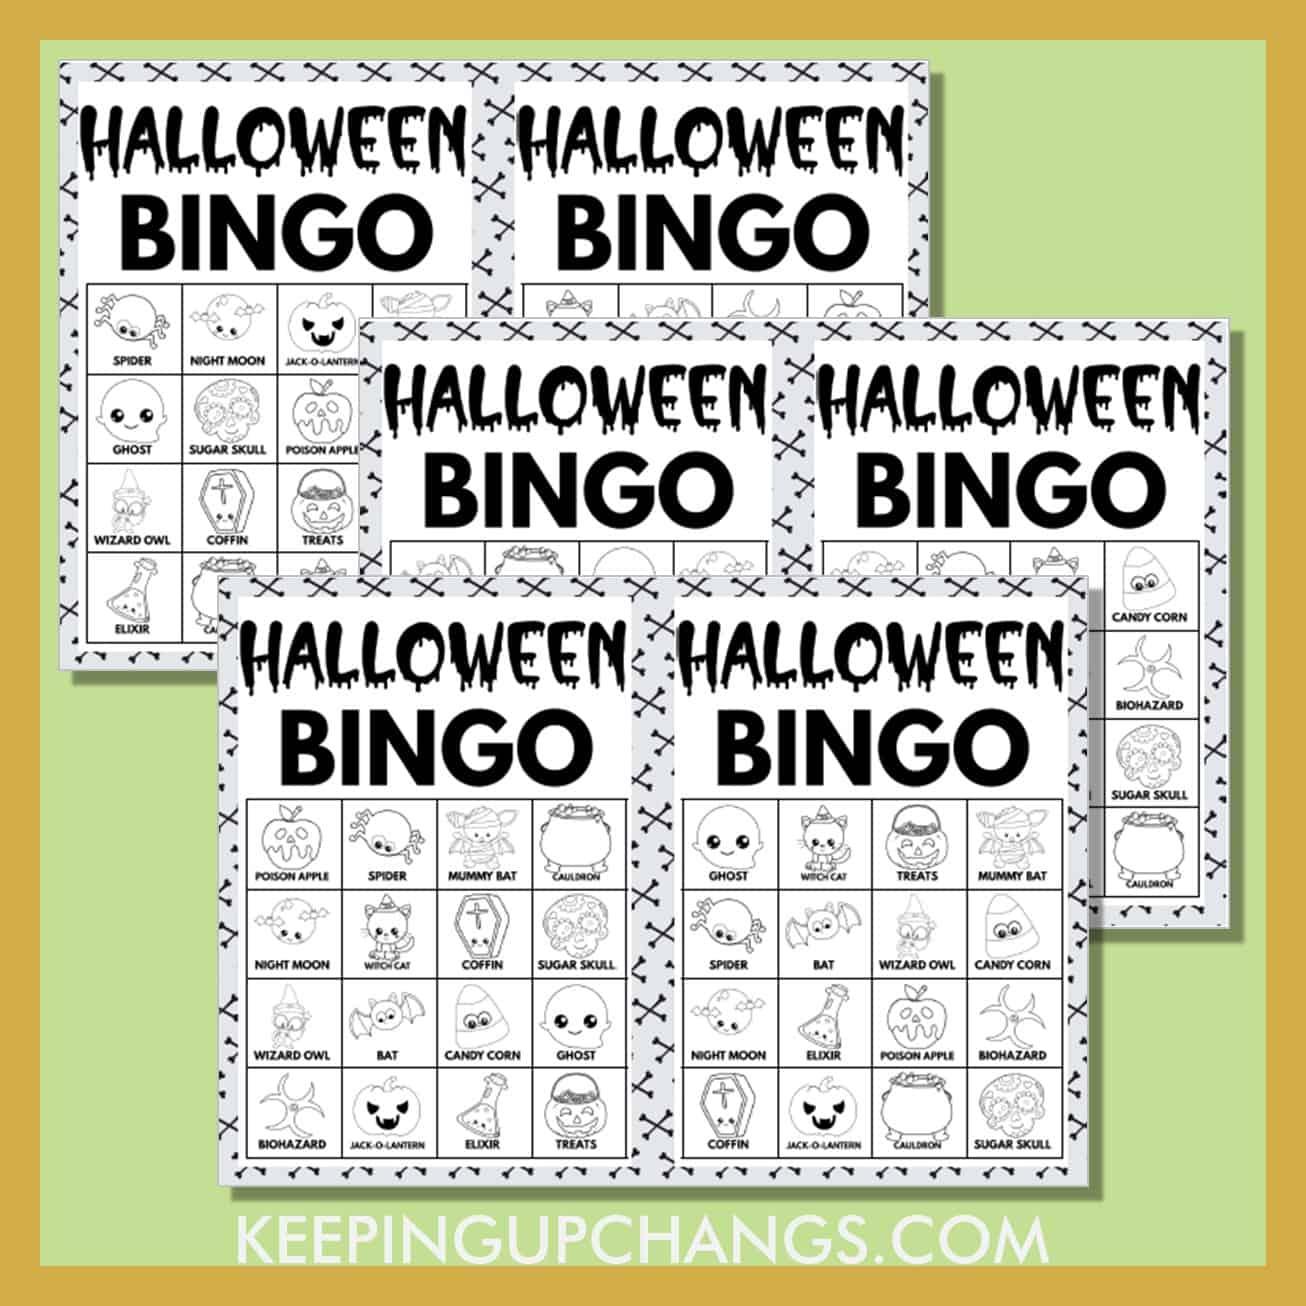 free fall halloween bingo 4x4 black white coloring game cards.